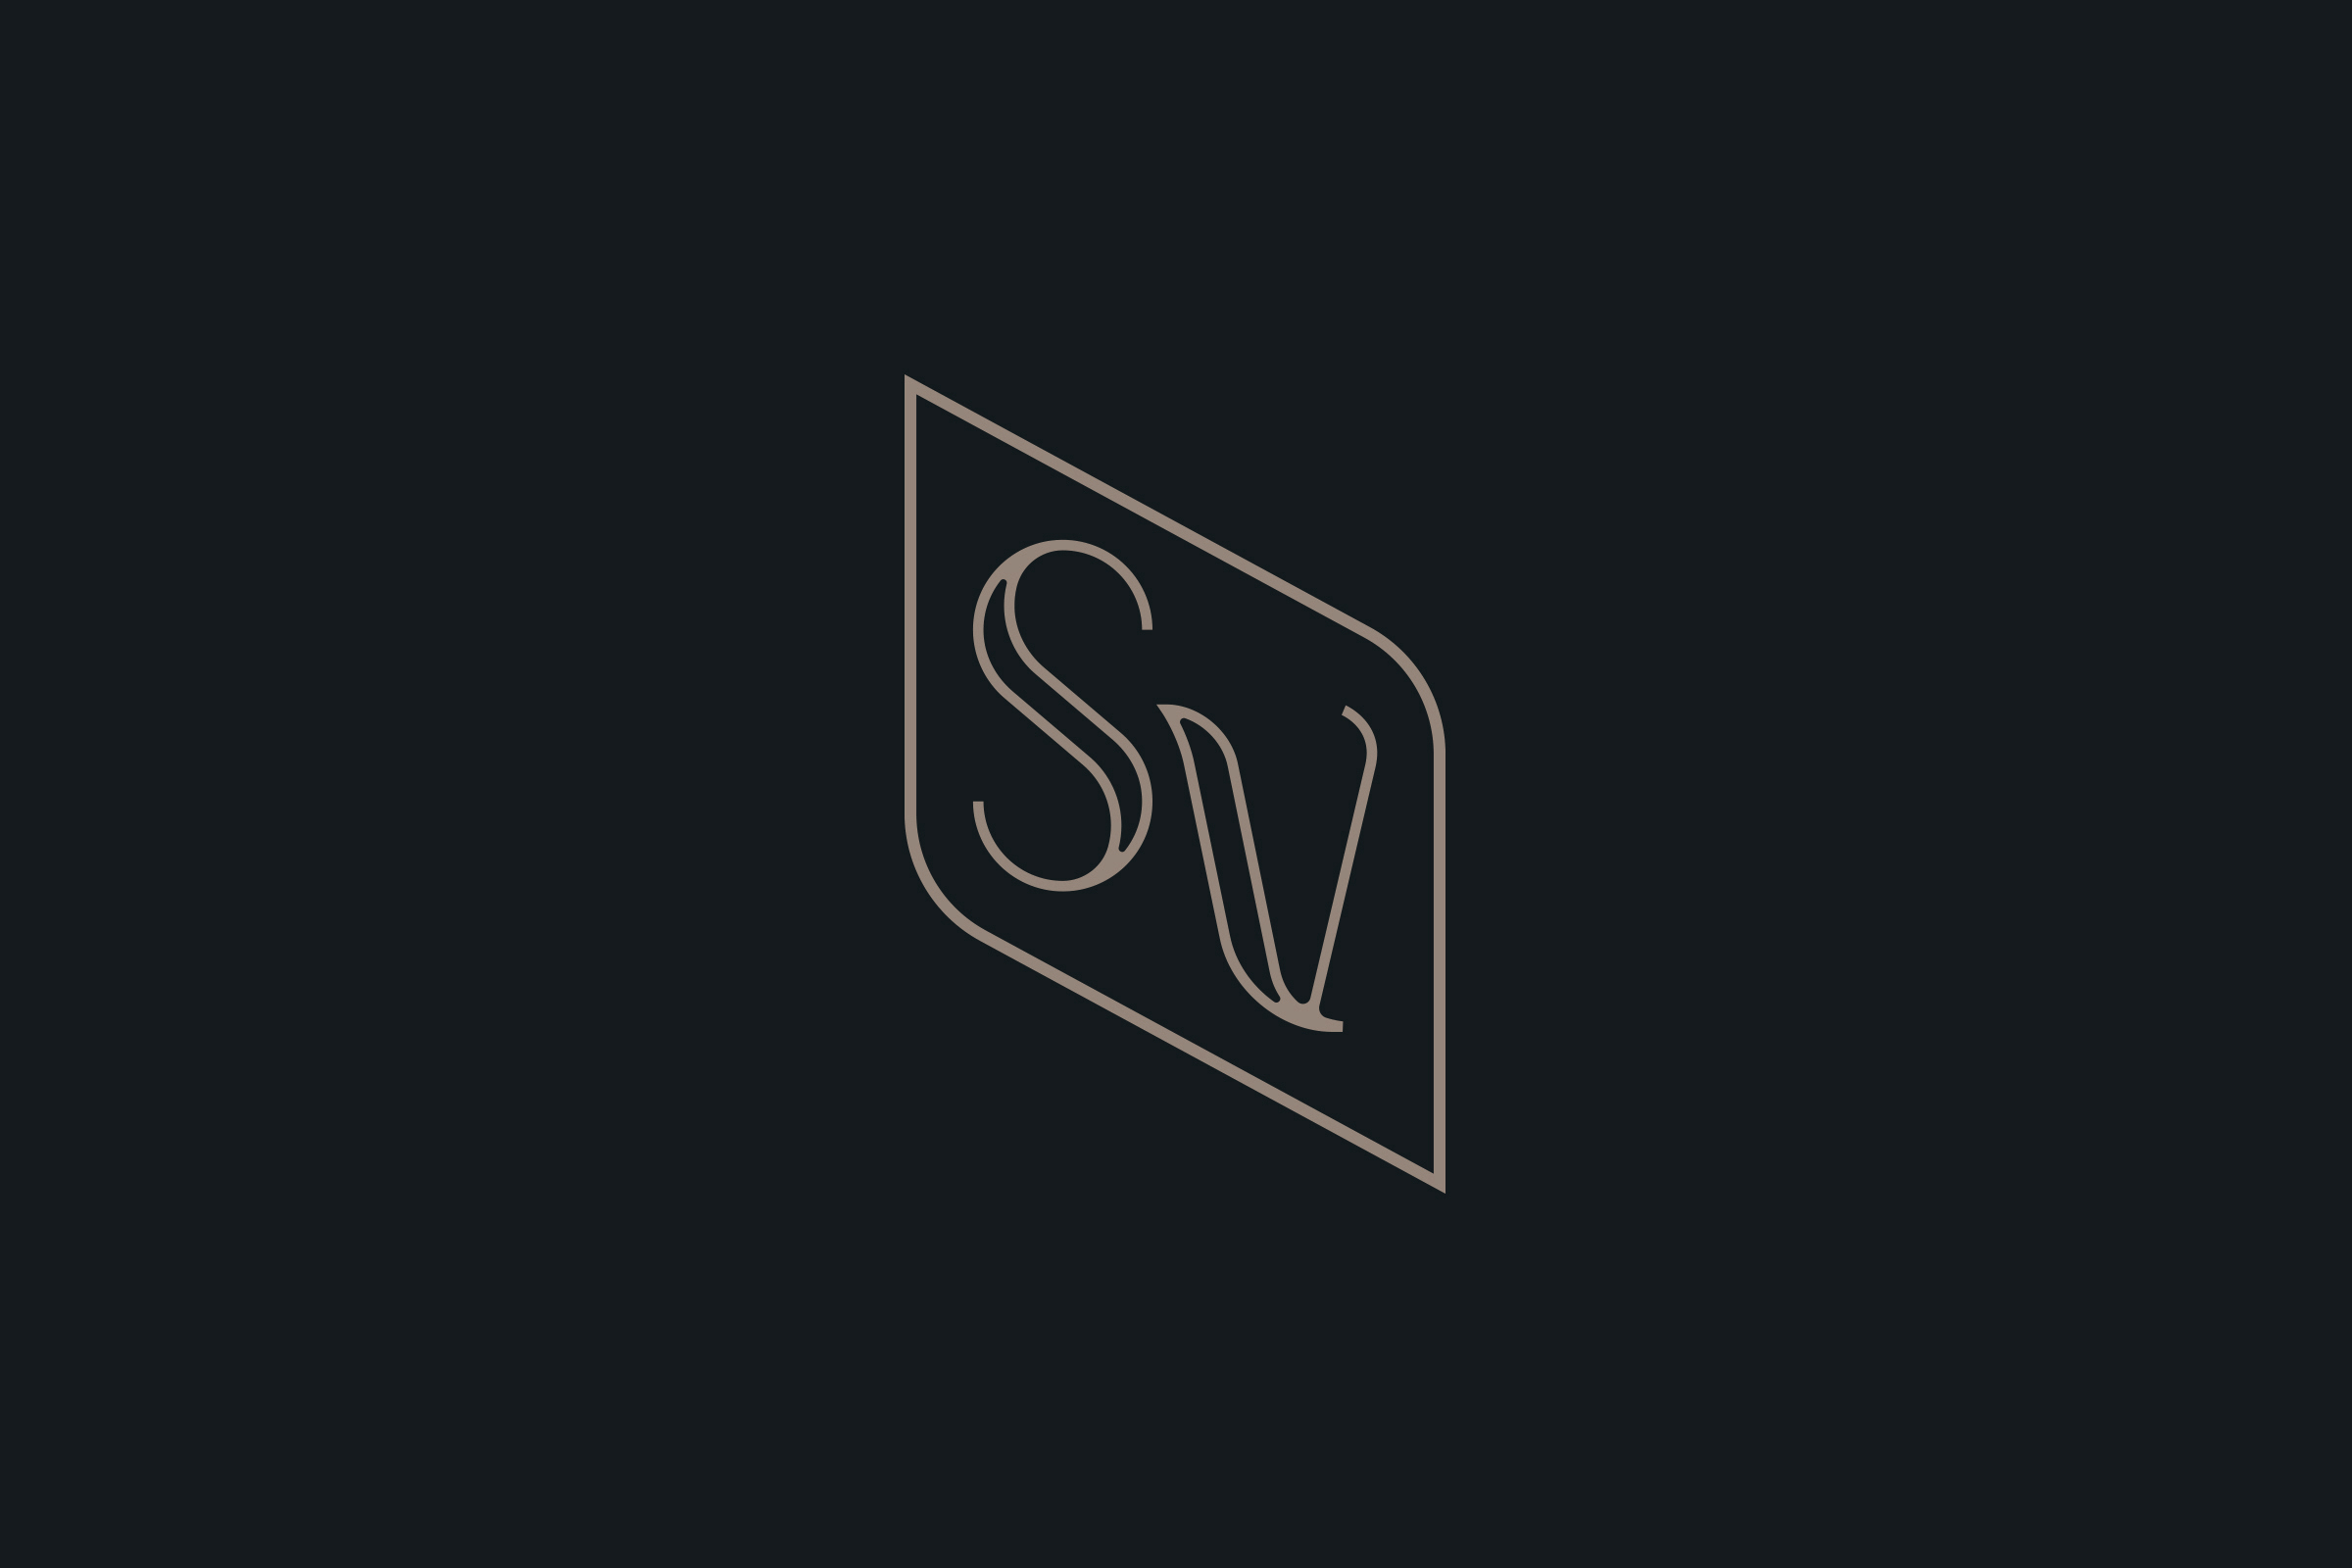 SV_monogram3